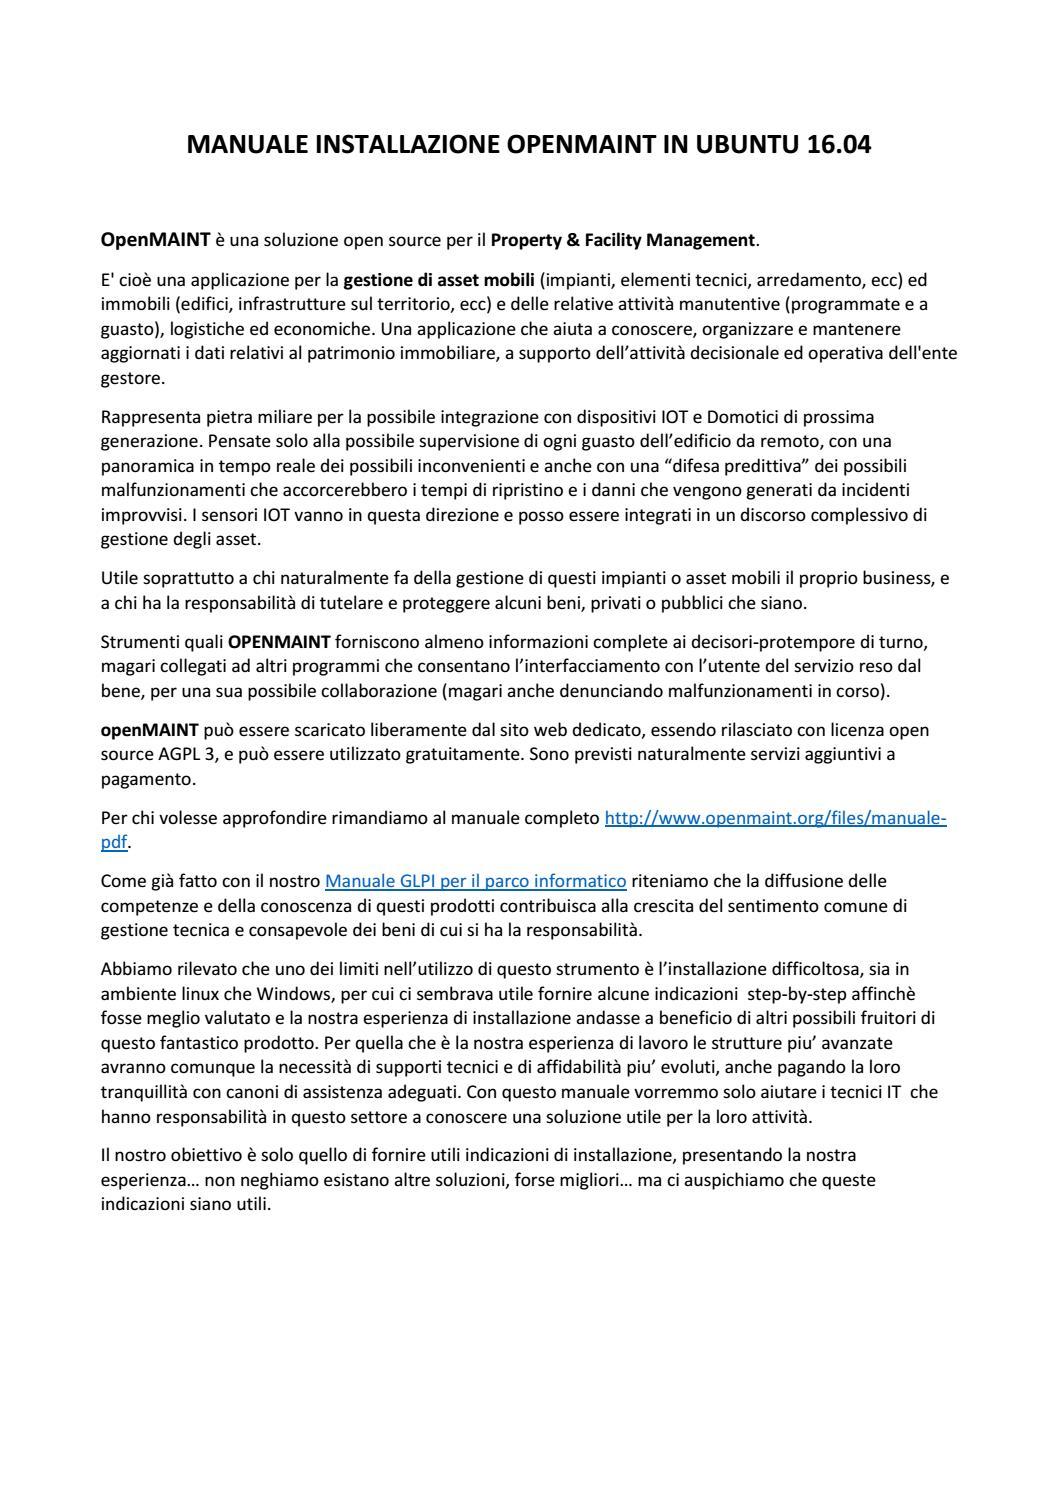 MANUALE INSTALLAZIONE OPENMAINT IN UBUNTU 16 04 - ITALIANO